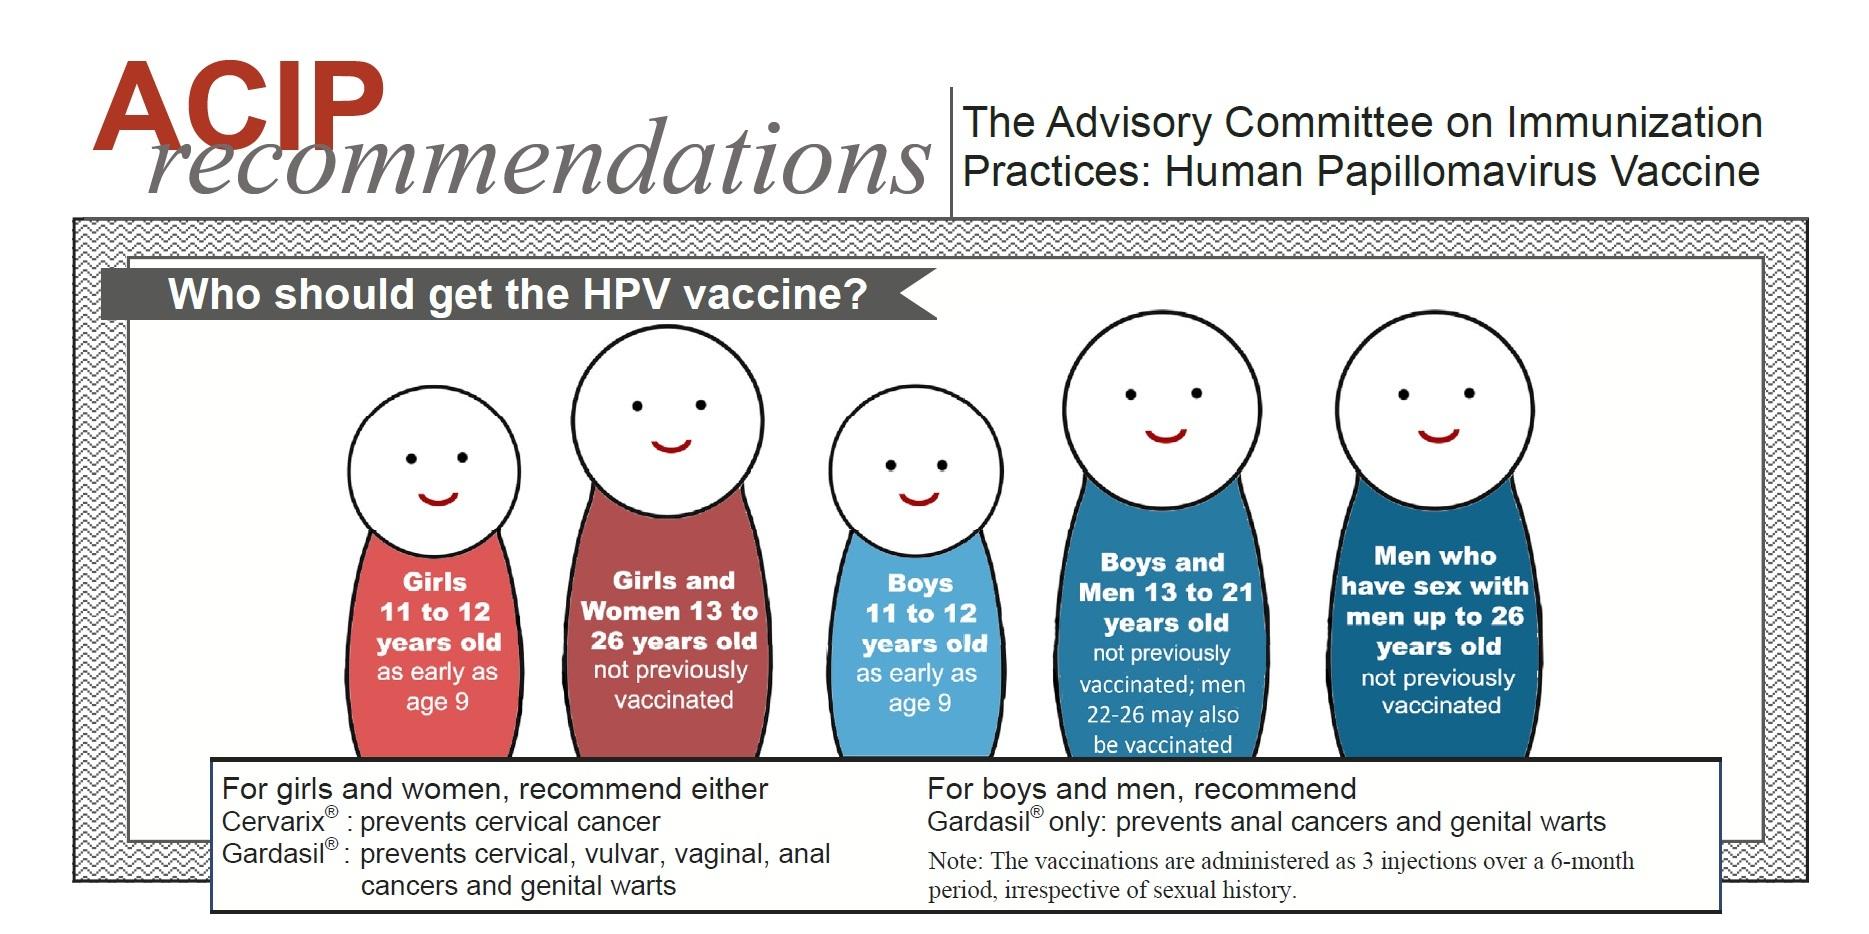 human papillomavirus vaccine period